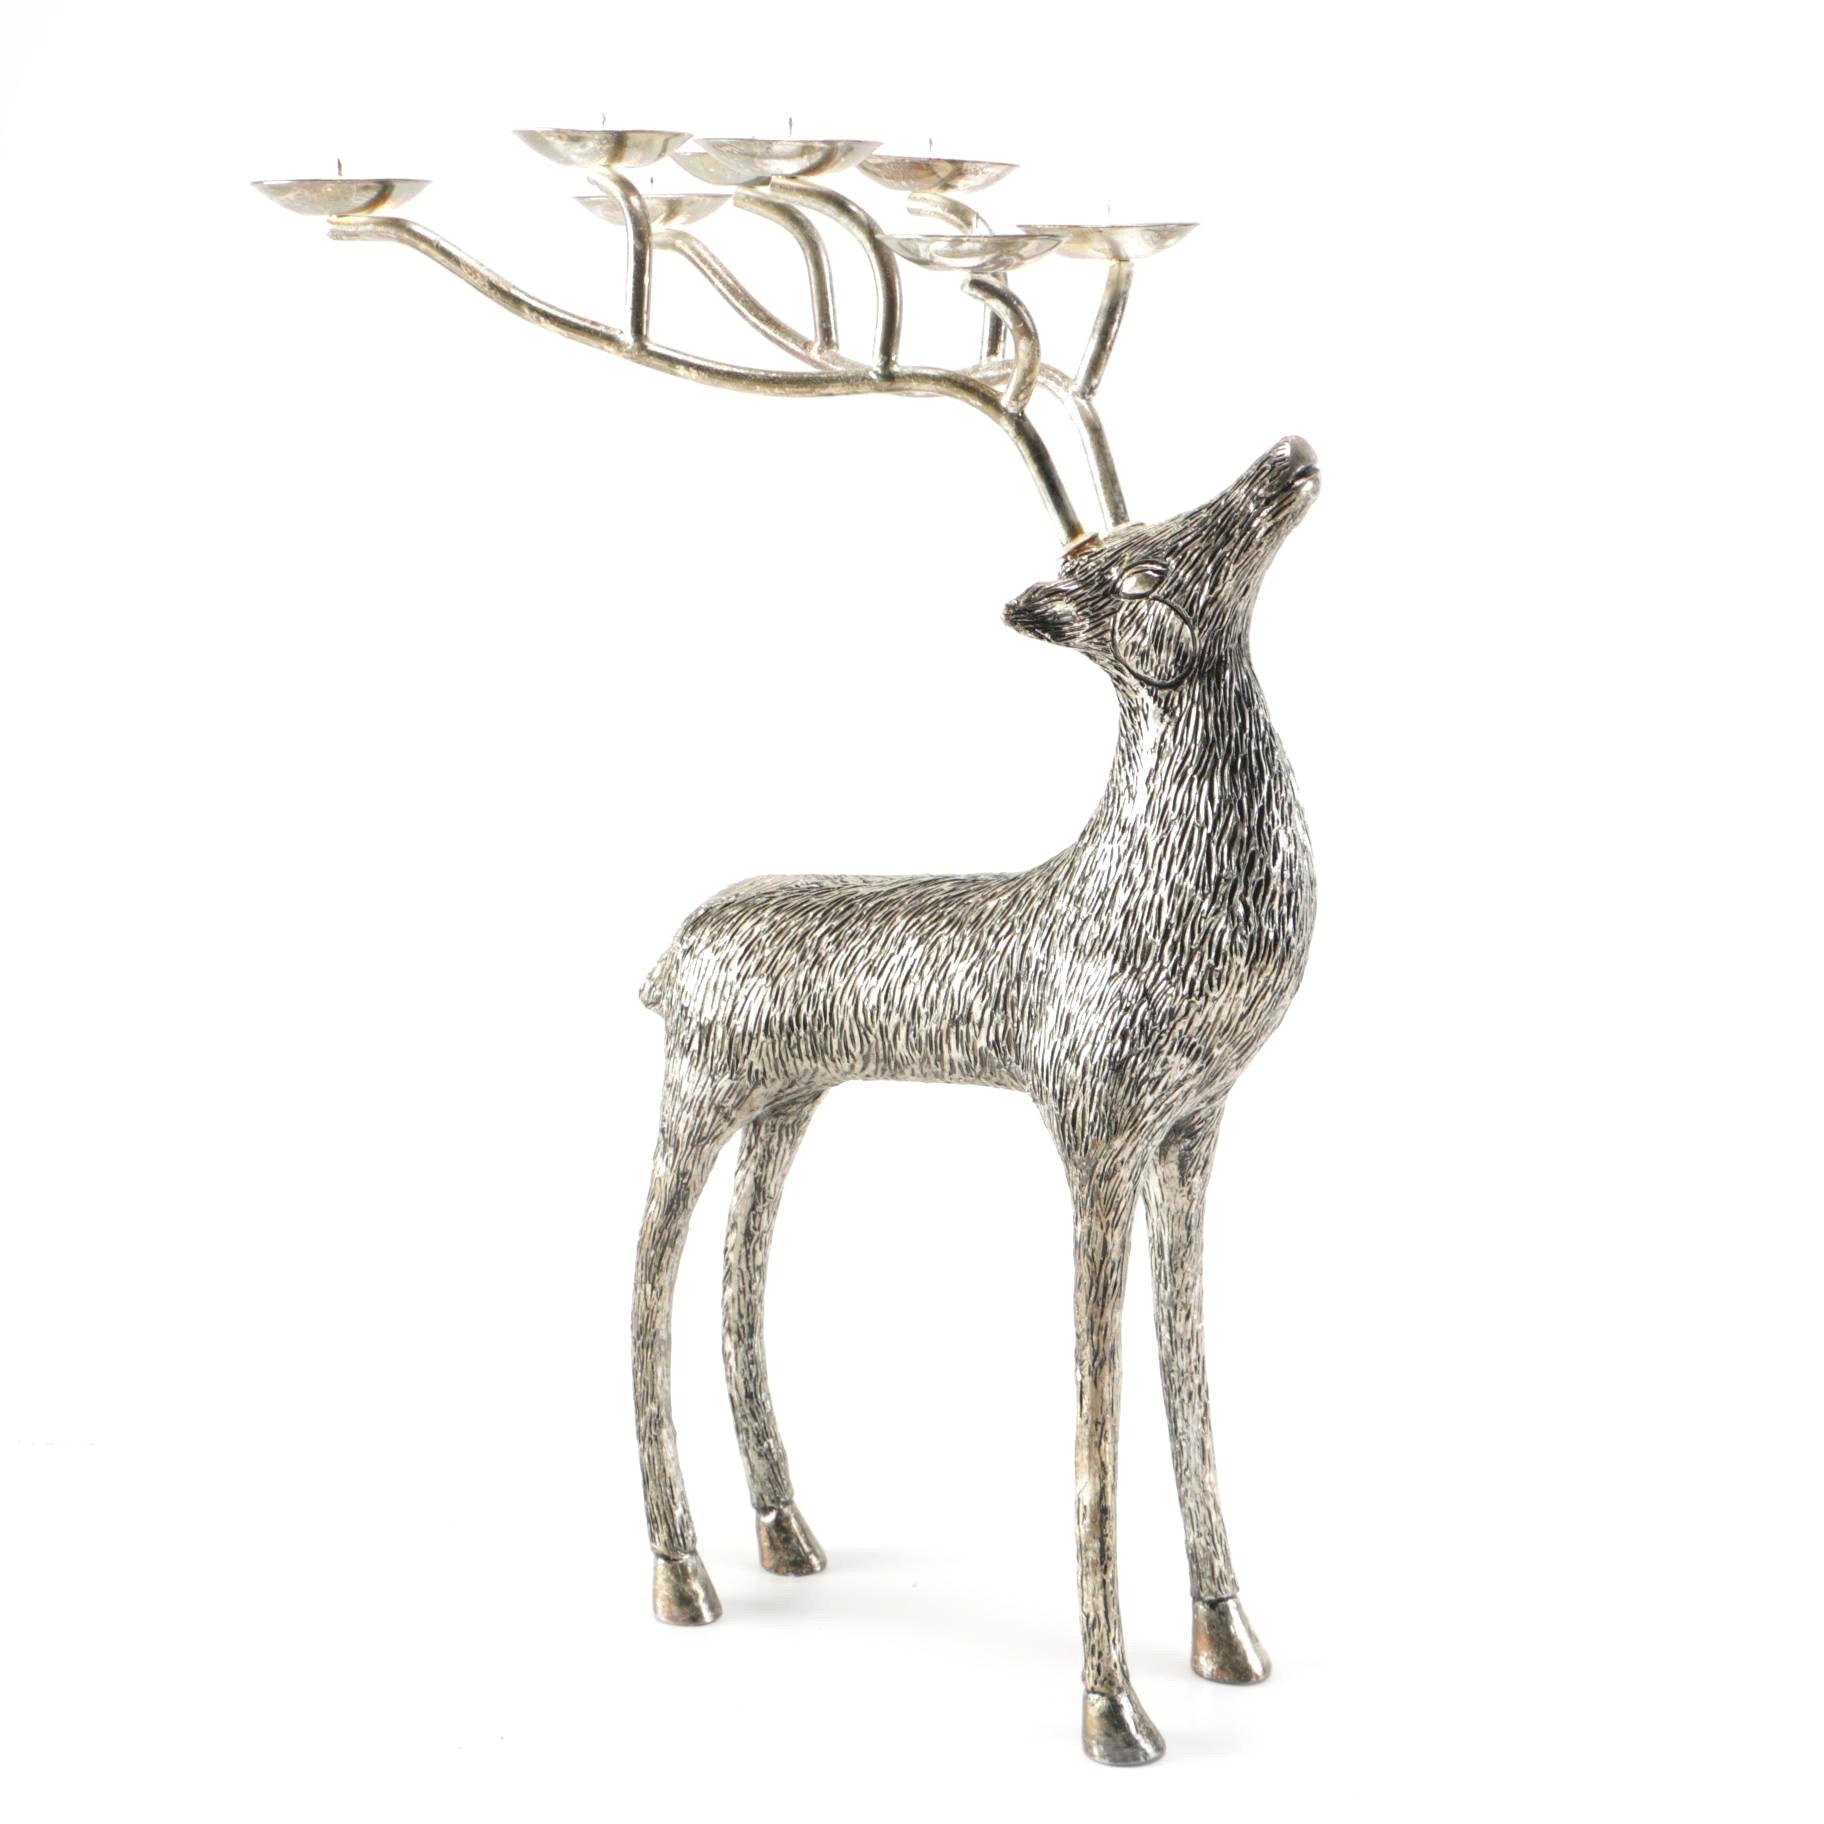 Silver Plate Reindeer Candleholder